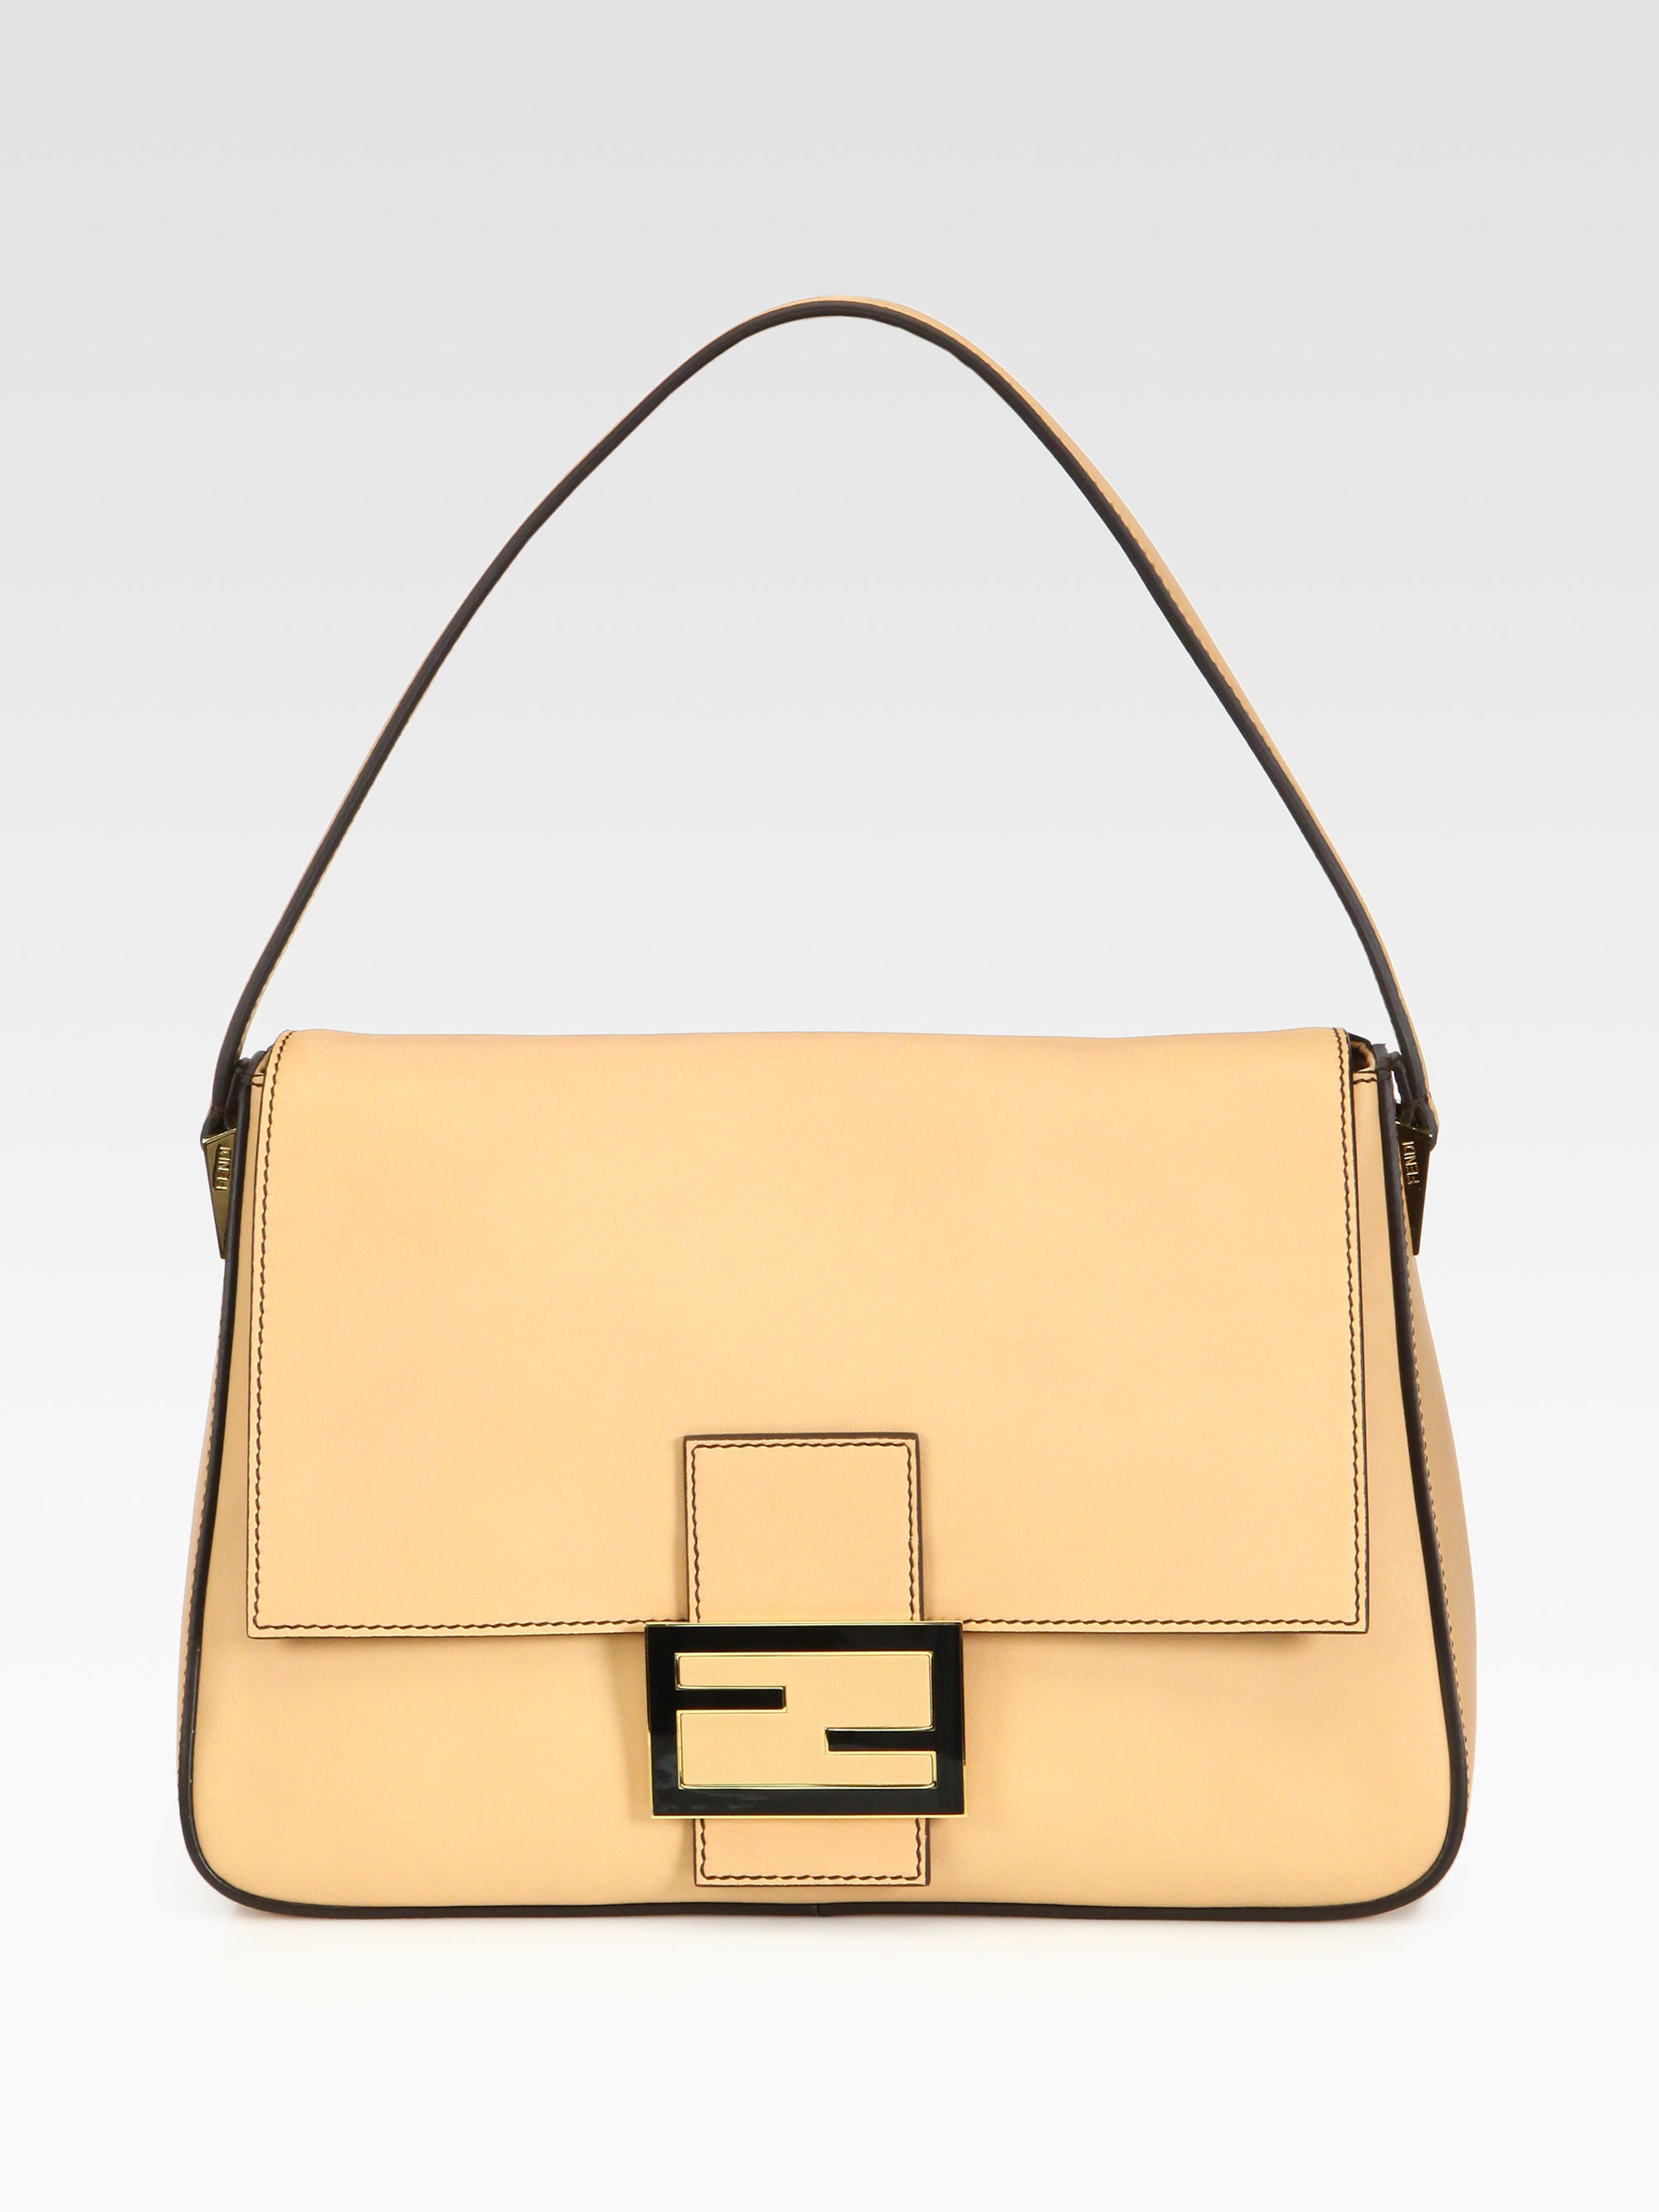 37c9a7ae0d48 buy fendi beige corduroy mama bag shoulder bag for sale 2e6b6 15f87  italy  lyst fendi forever mama bag in natural e8f82 1e1a4